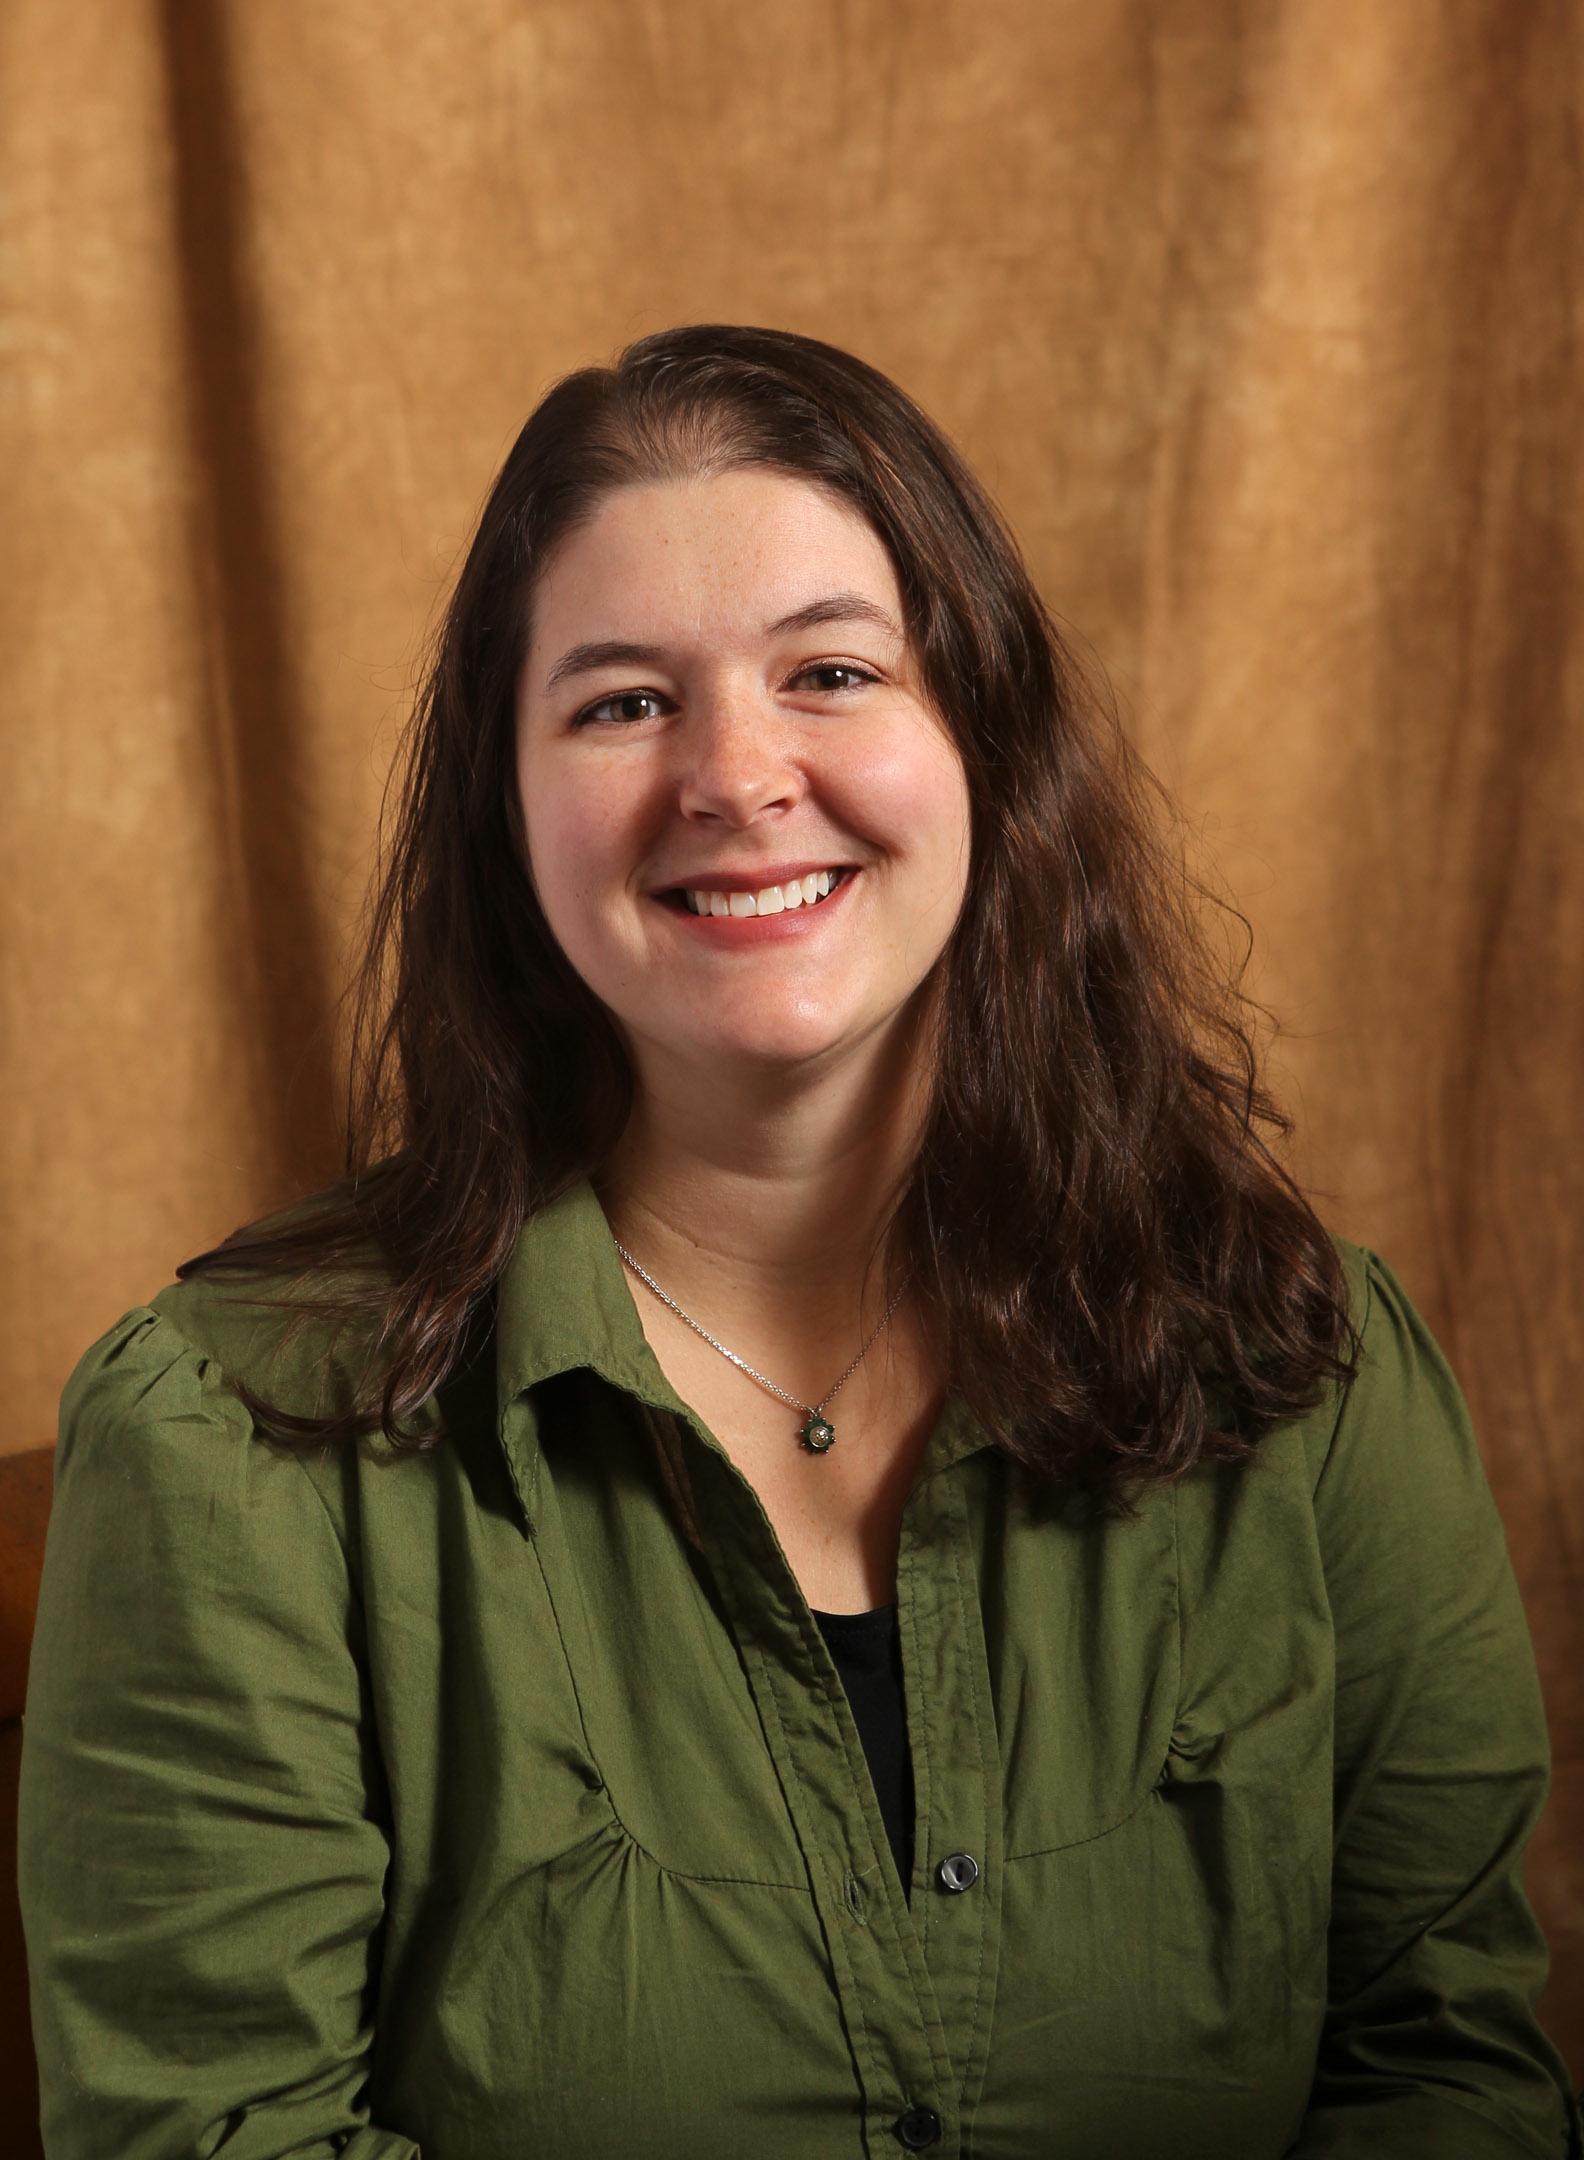 Dr. Kimberly Woznack